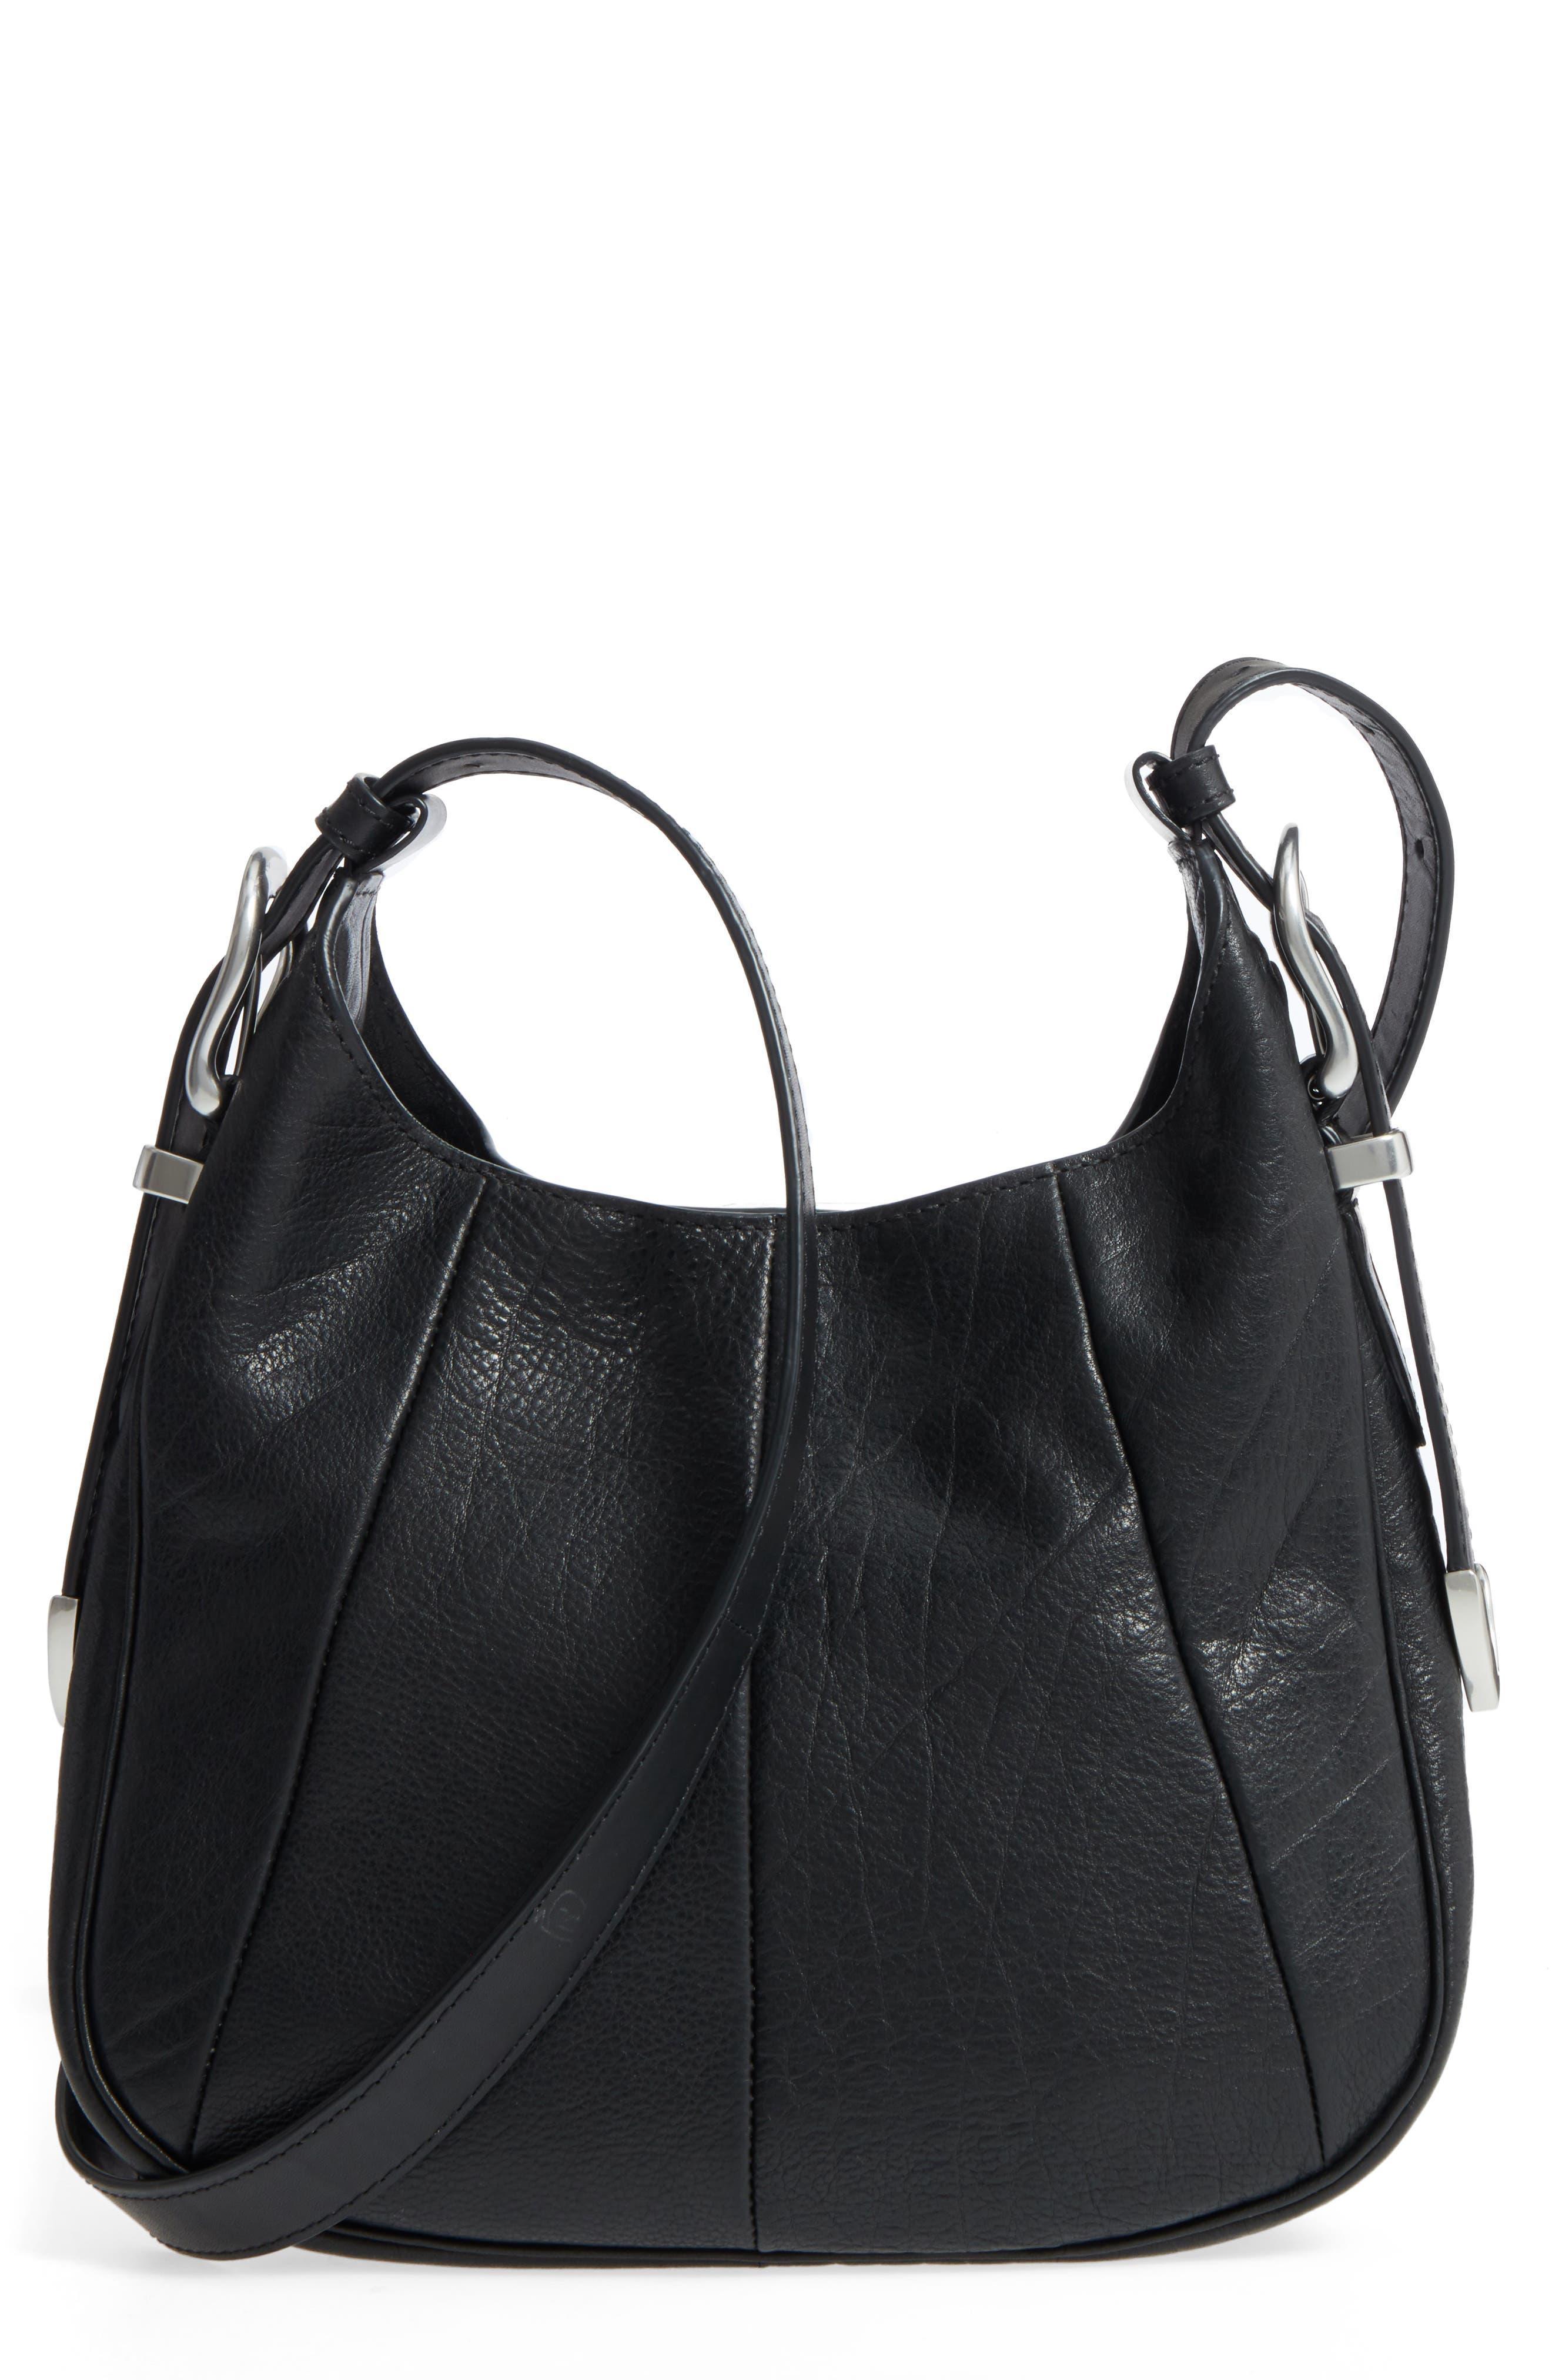 Frye Jacqui Leather Crossbody Bag